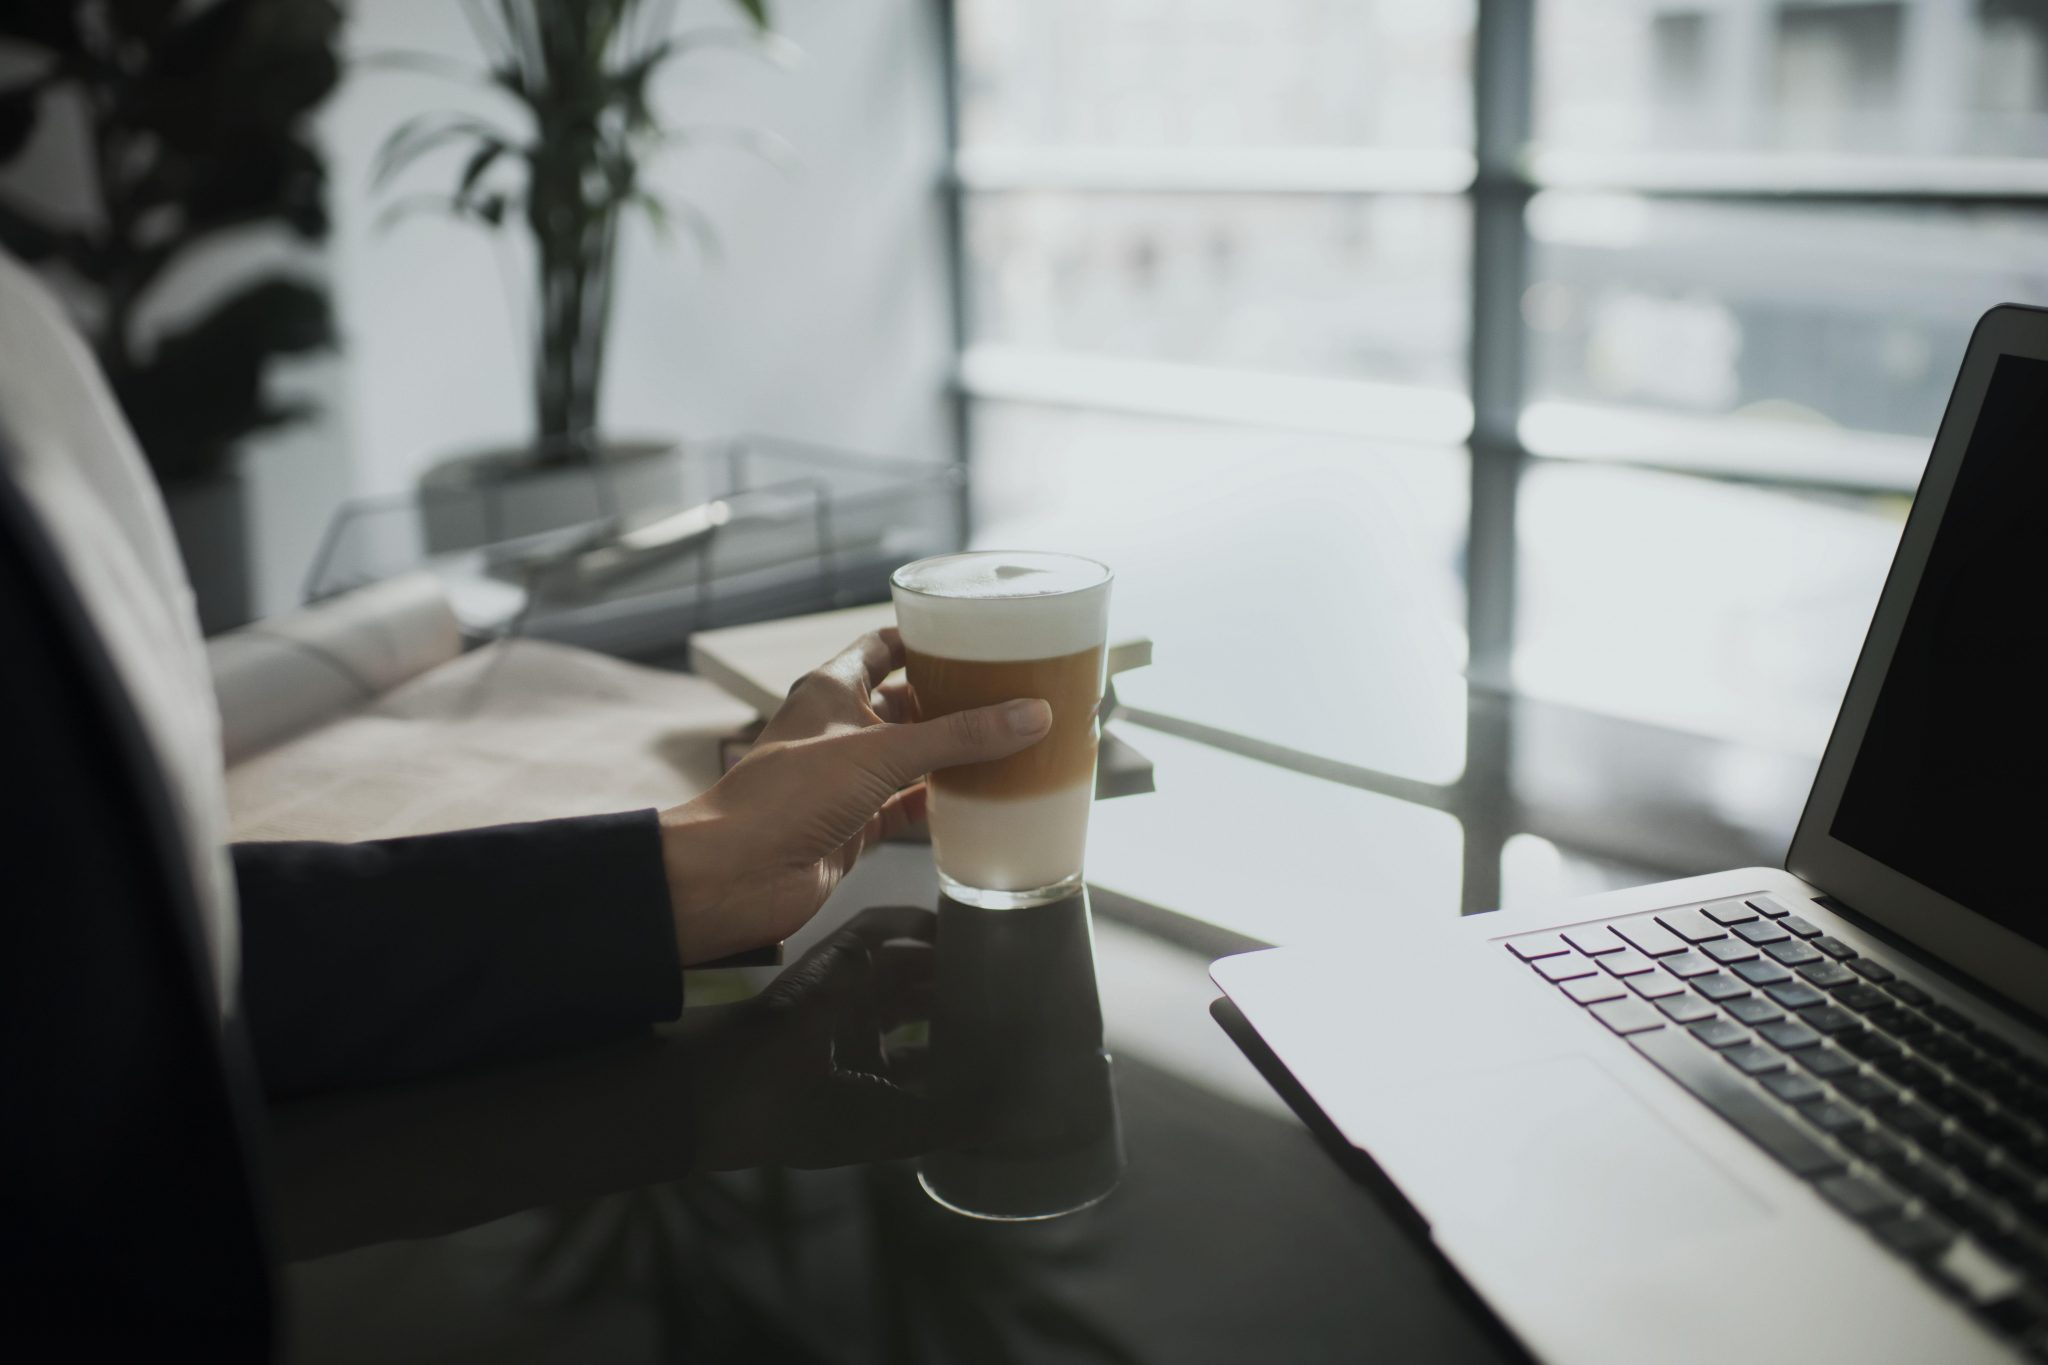 Tomar café delante de un ordenador